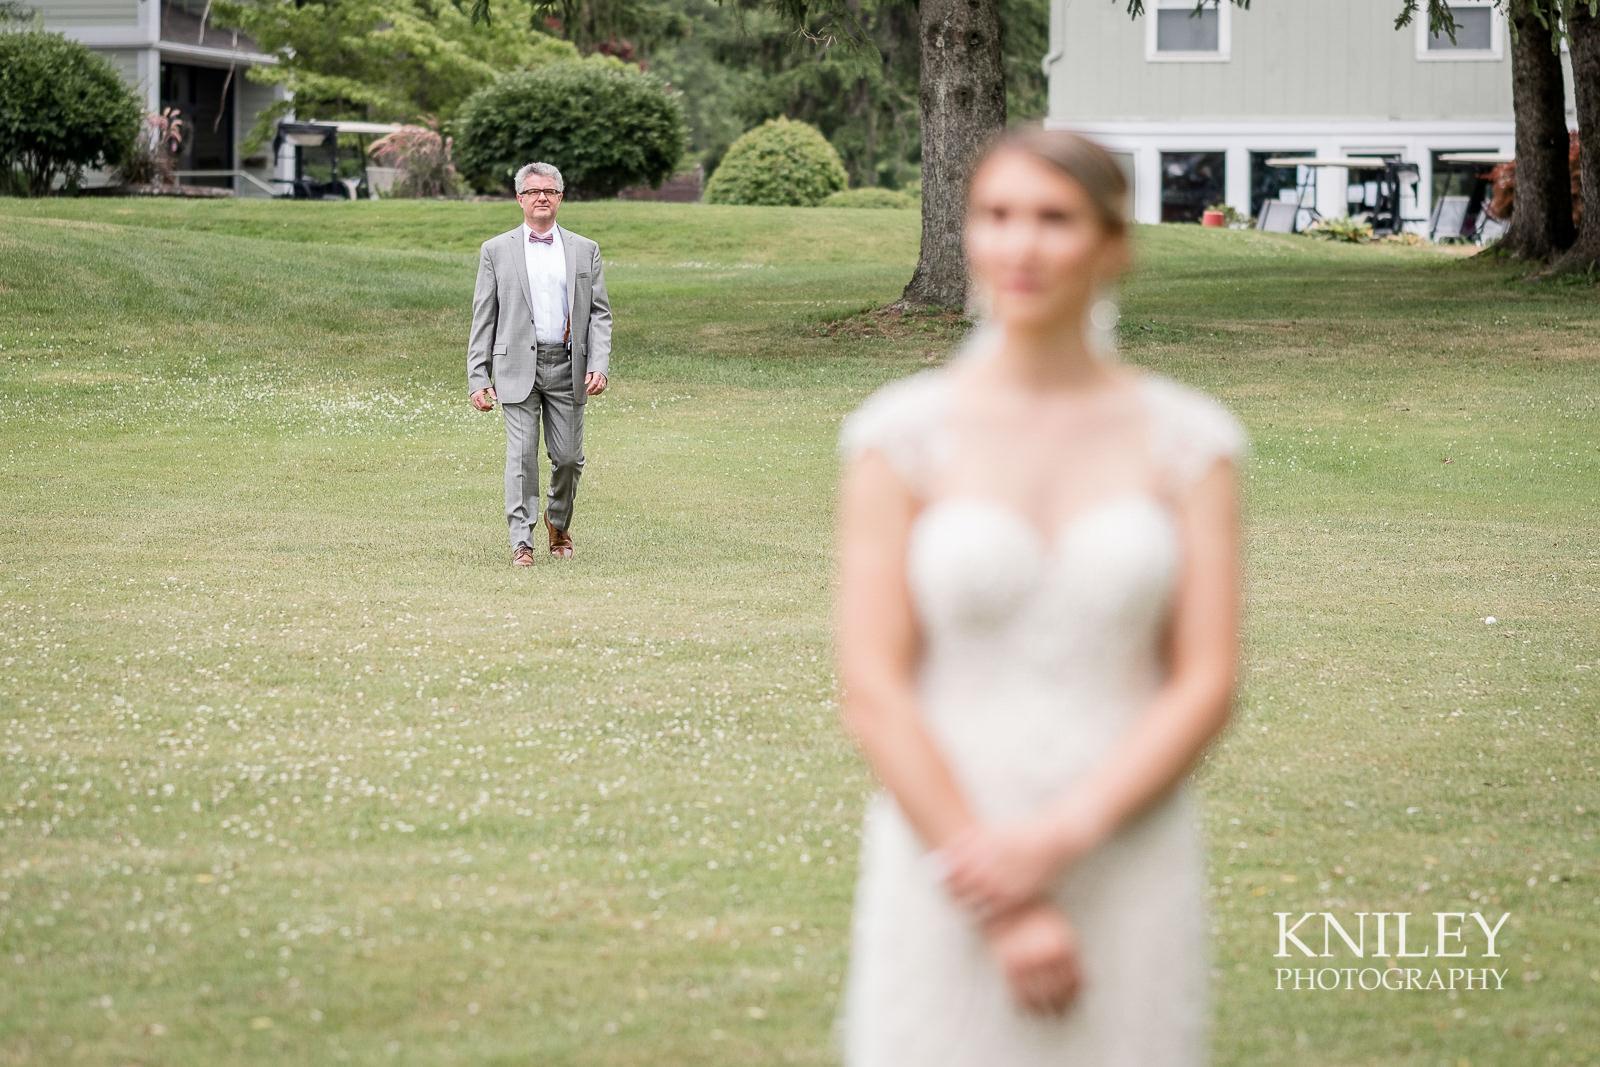 018 - Ontario Golf Club Wedding Pictures - XT2A6487.jpg